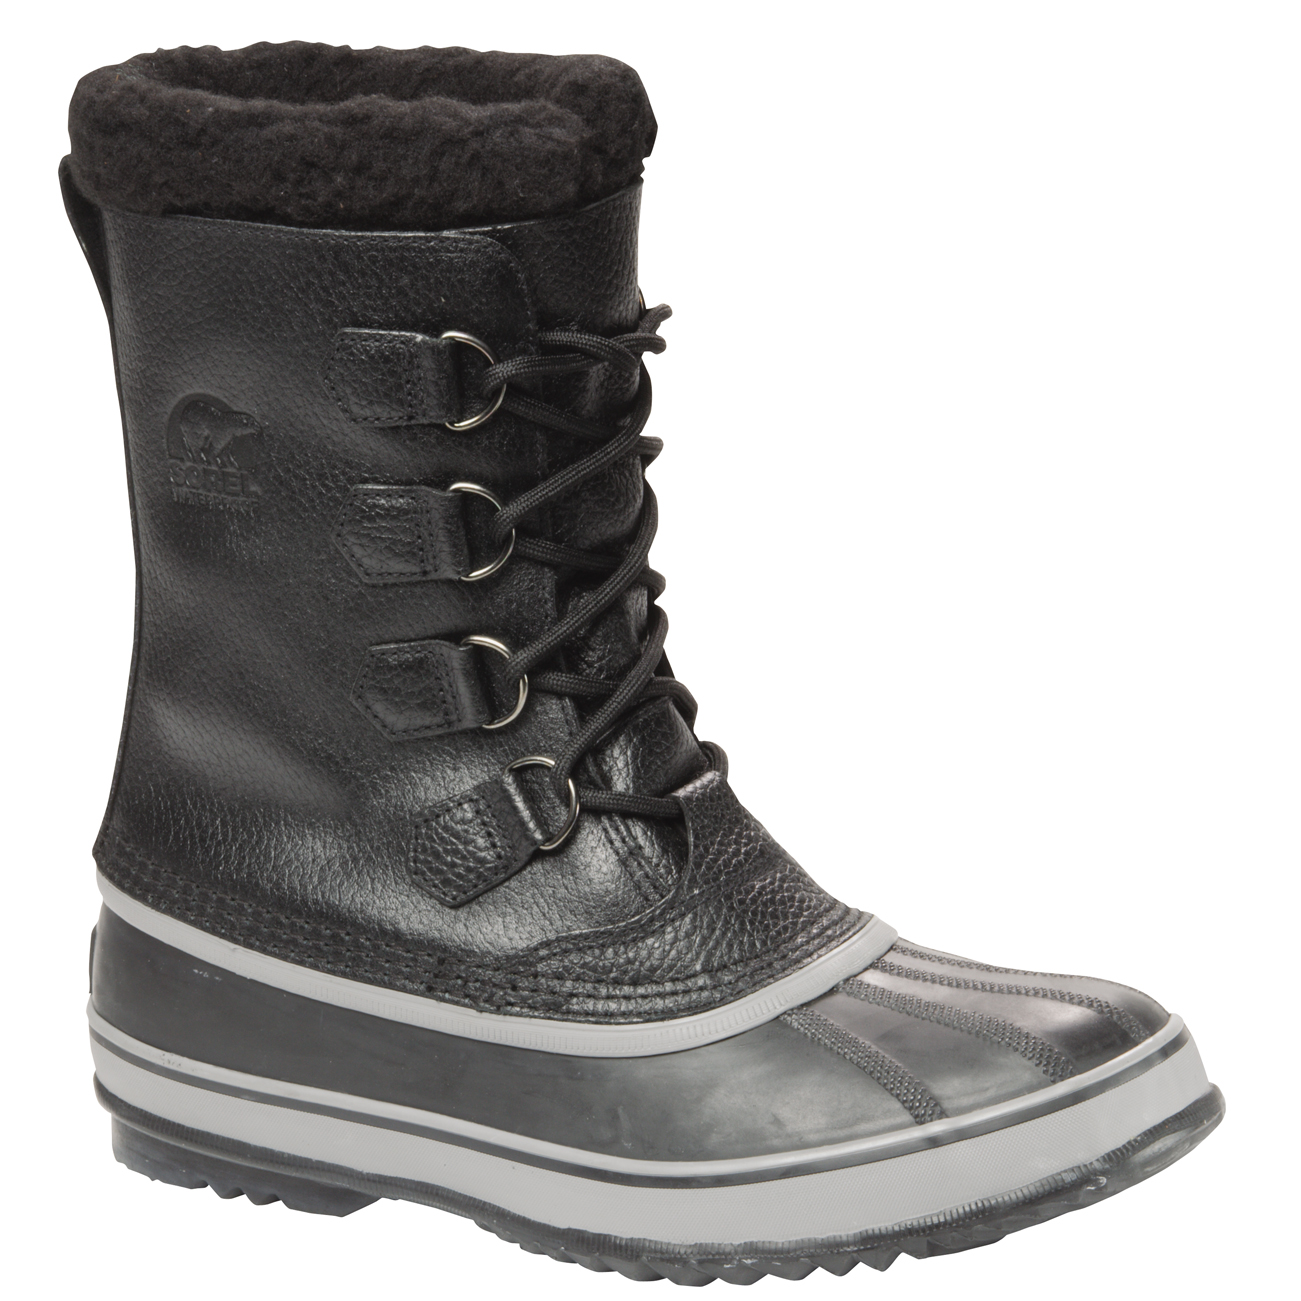 Mens Sorel 1964 Pac Winter Snow Waterproof Hiking 7-12 Rain Walking Boots UK 7-12 Hiking f1201a